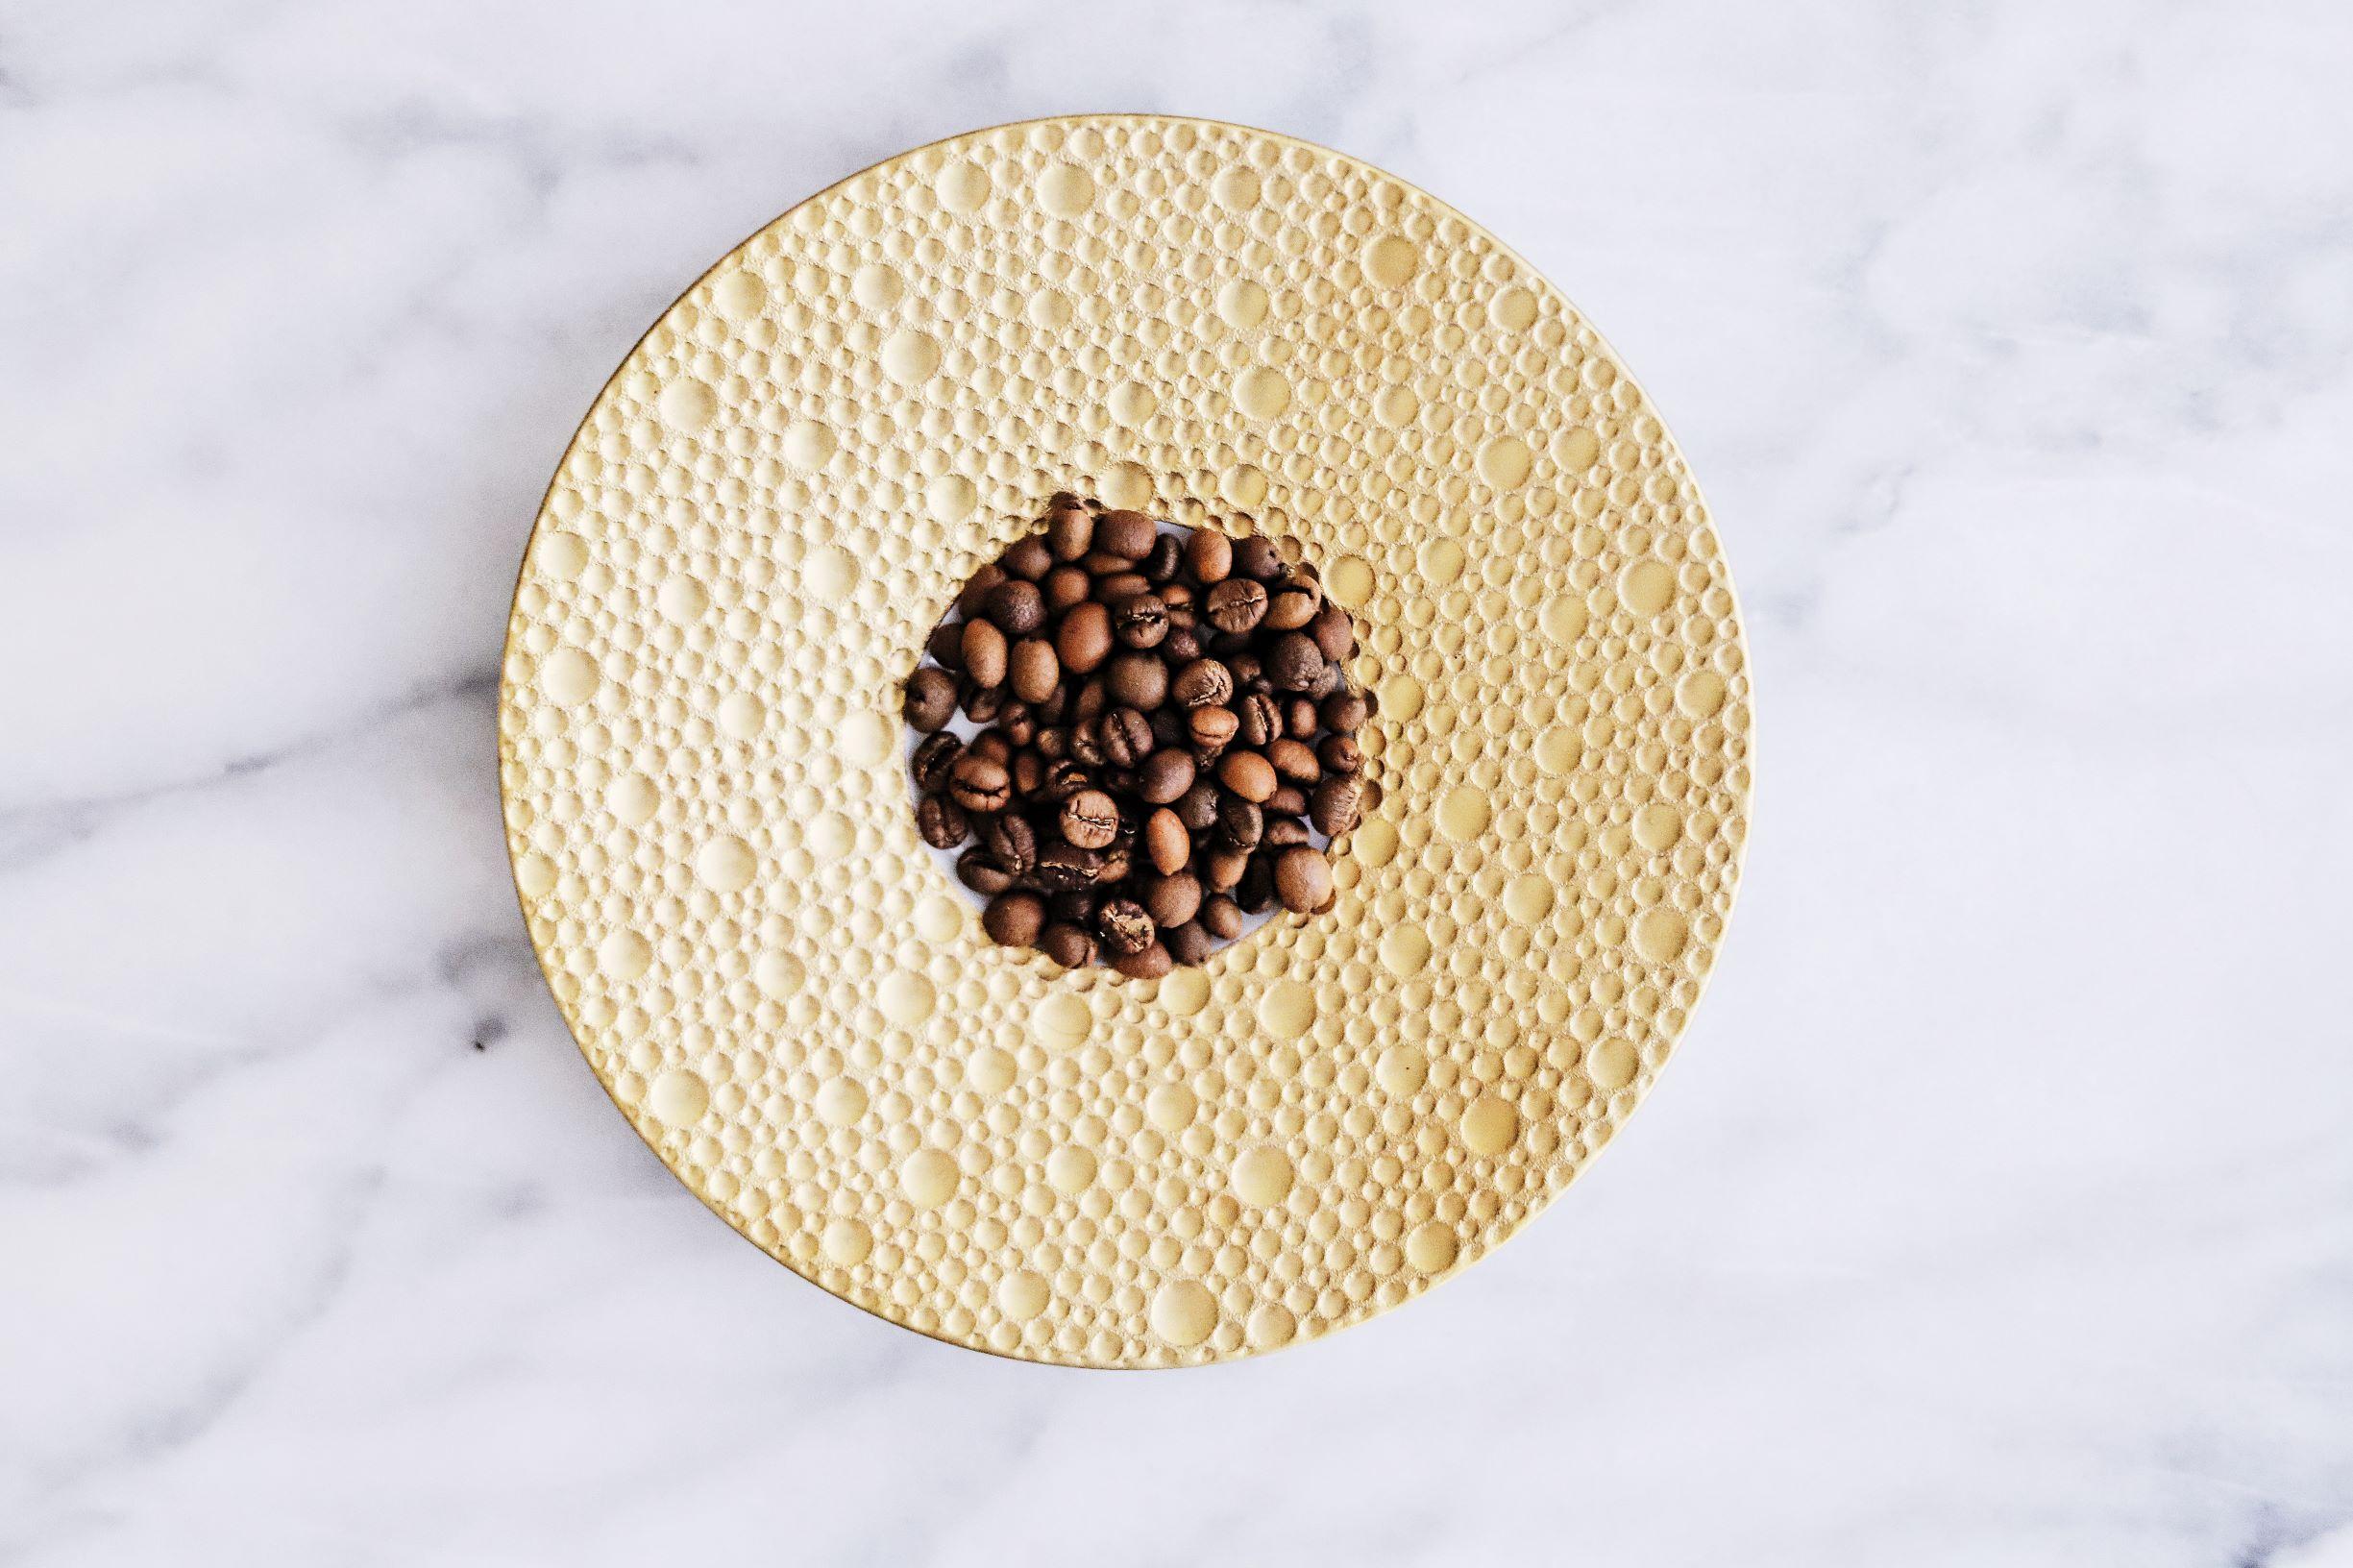 Racemosa Coffee Beans, Coffea Racemosa